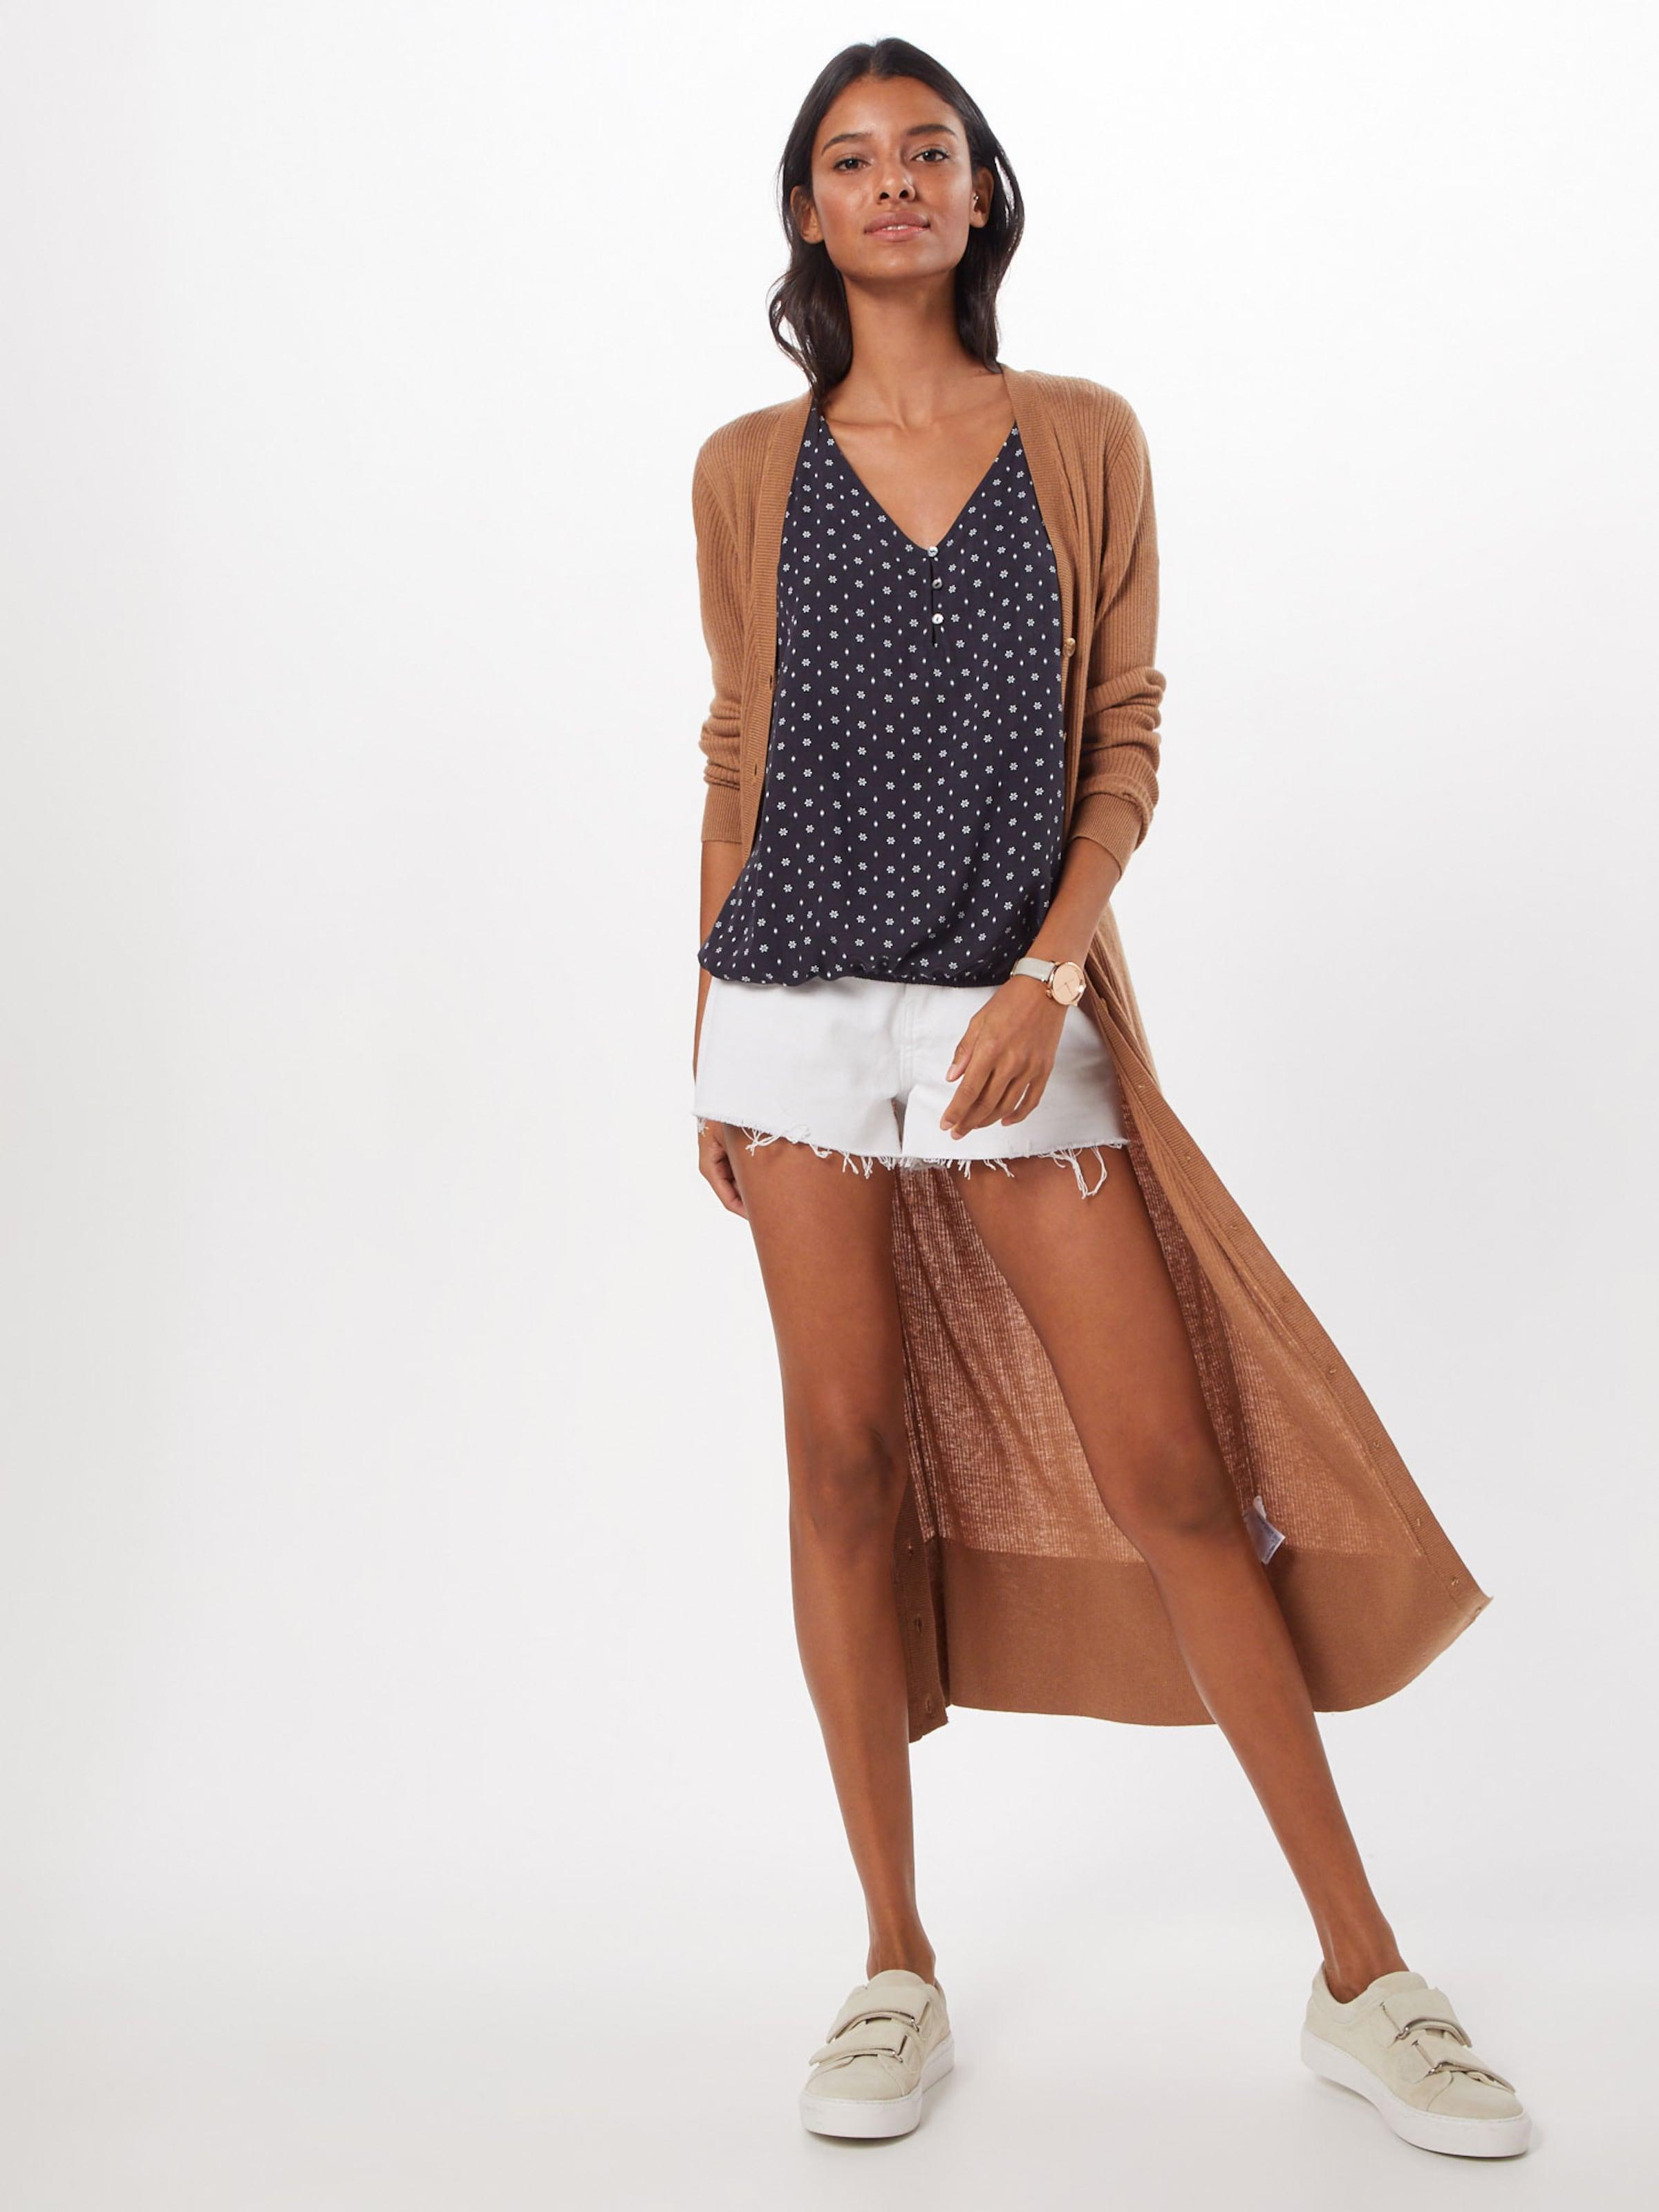 Blouses Woven Esprit Bluse Fluid 'osn Short In Schwarz Visco Sleeve' SzVUpM